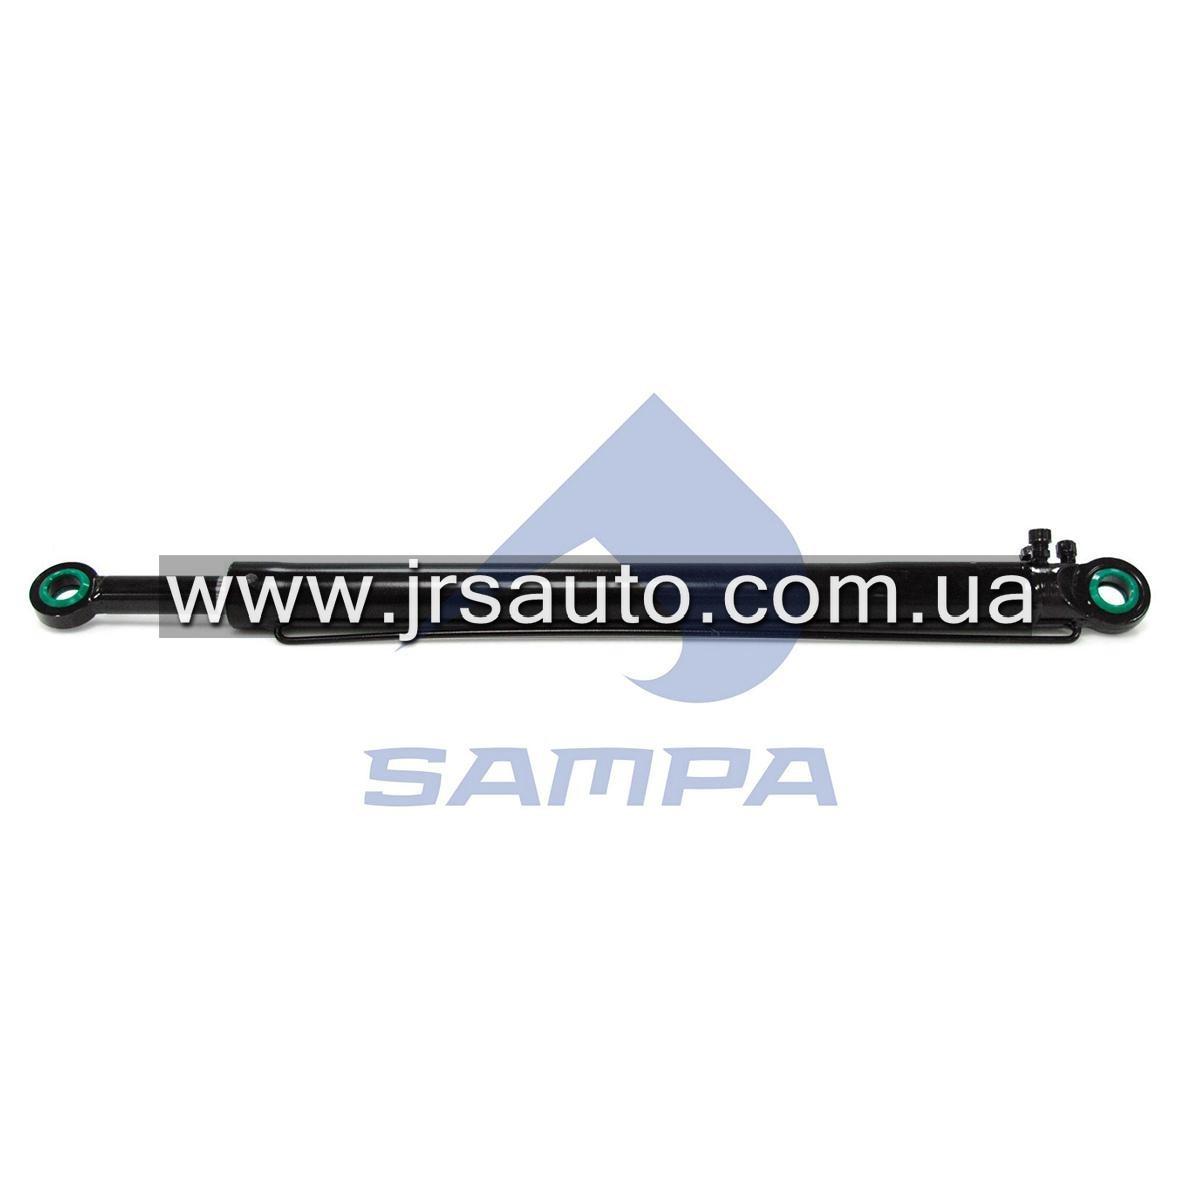 Цилиндр опрокидывания кабины DAF \1349831 \ 050.350